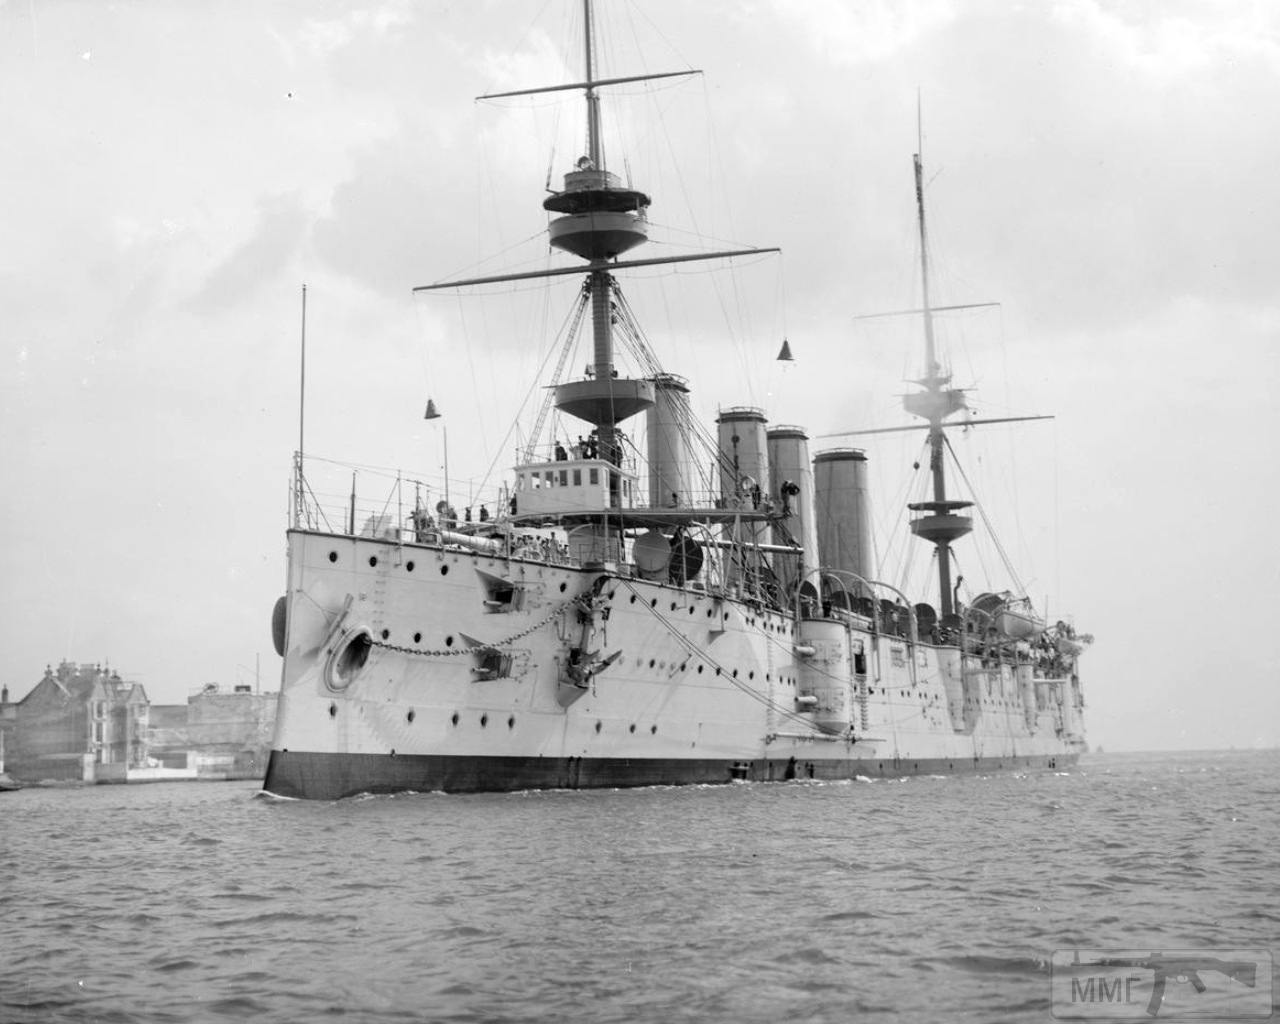 52504 - HMS Terrible